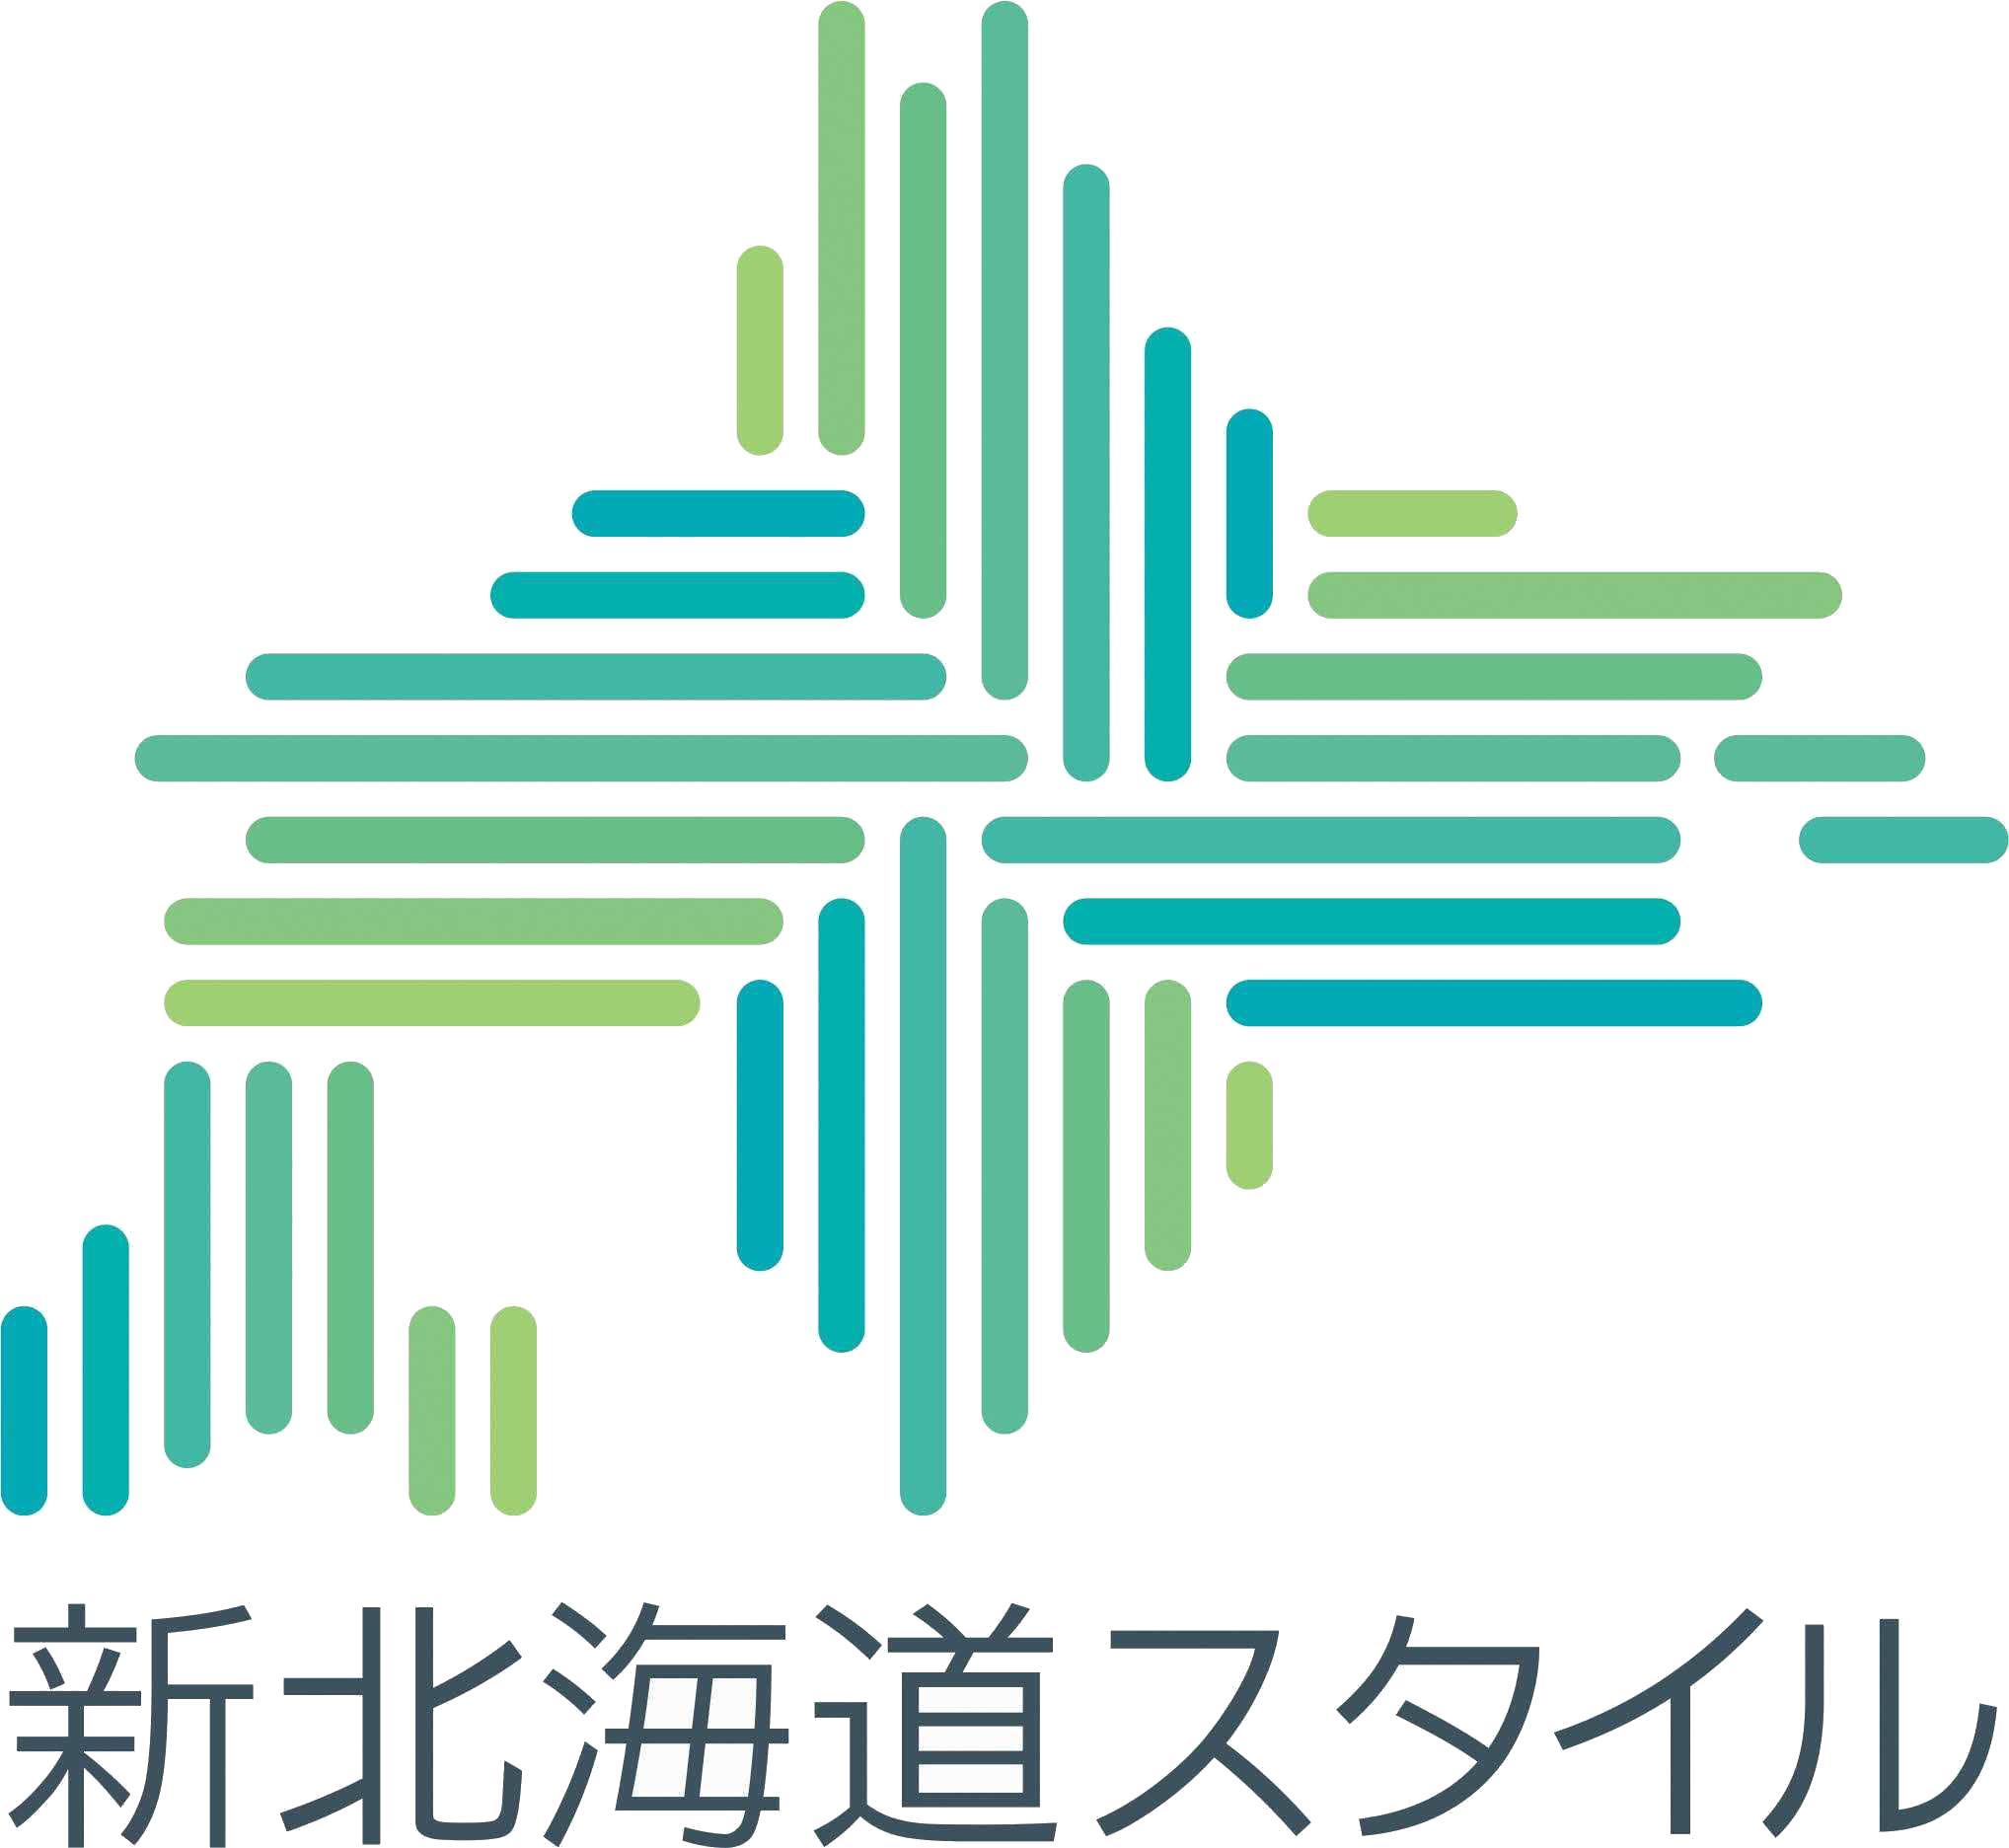 New Hokkaido Style logo